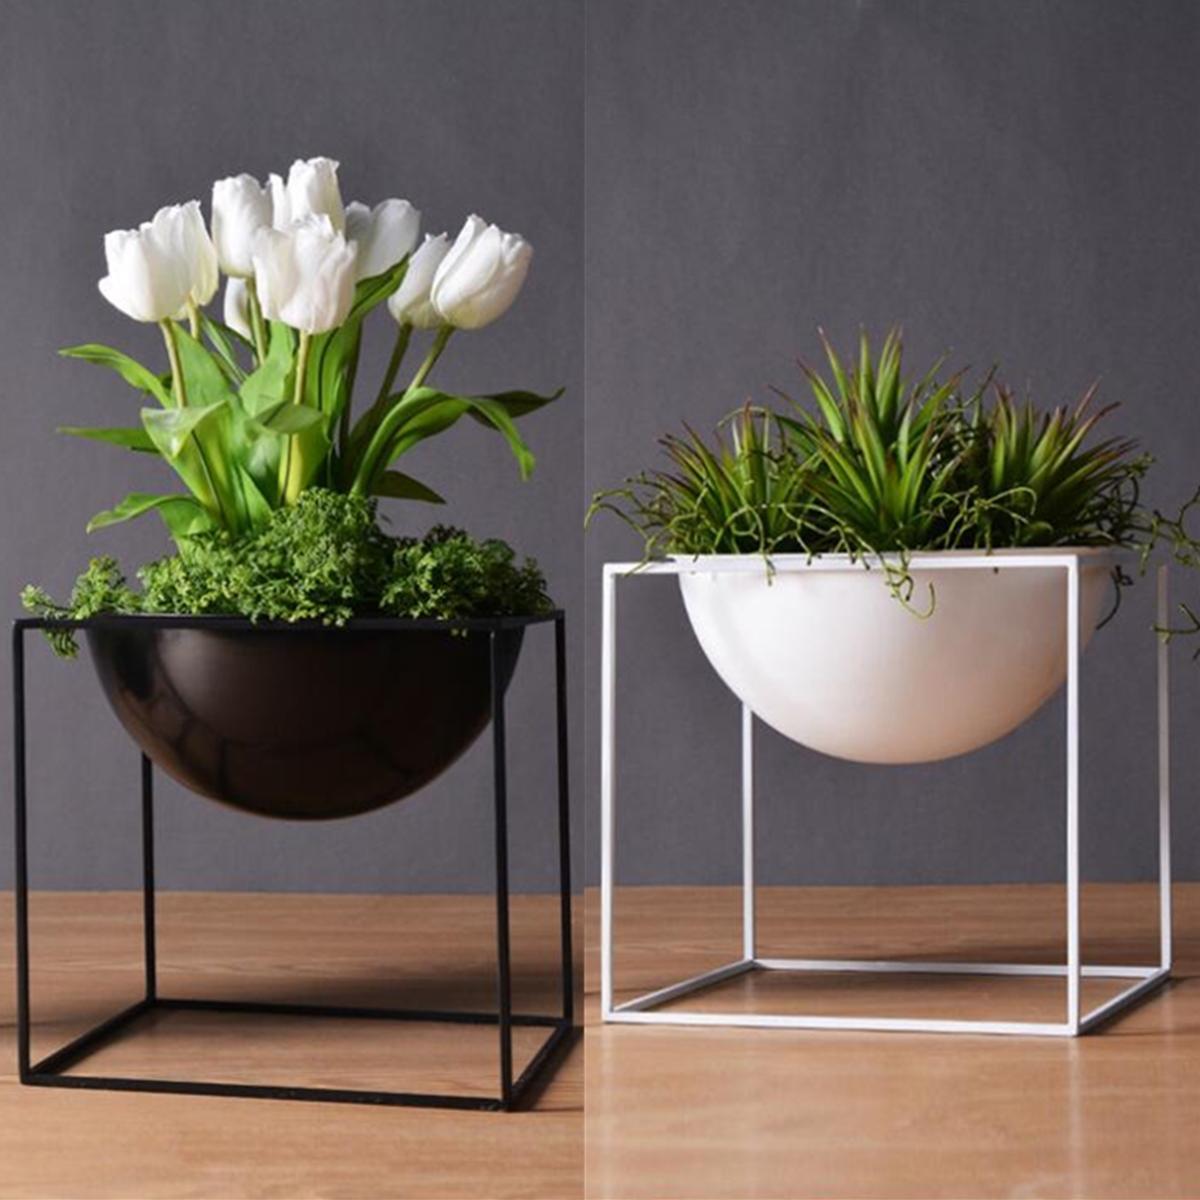 20cm Flower Pot Holder Metal Pot Stand Planter Garden Home Decorations Flower Display Rack COD